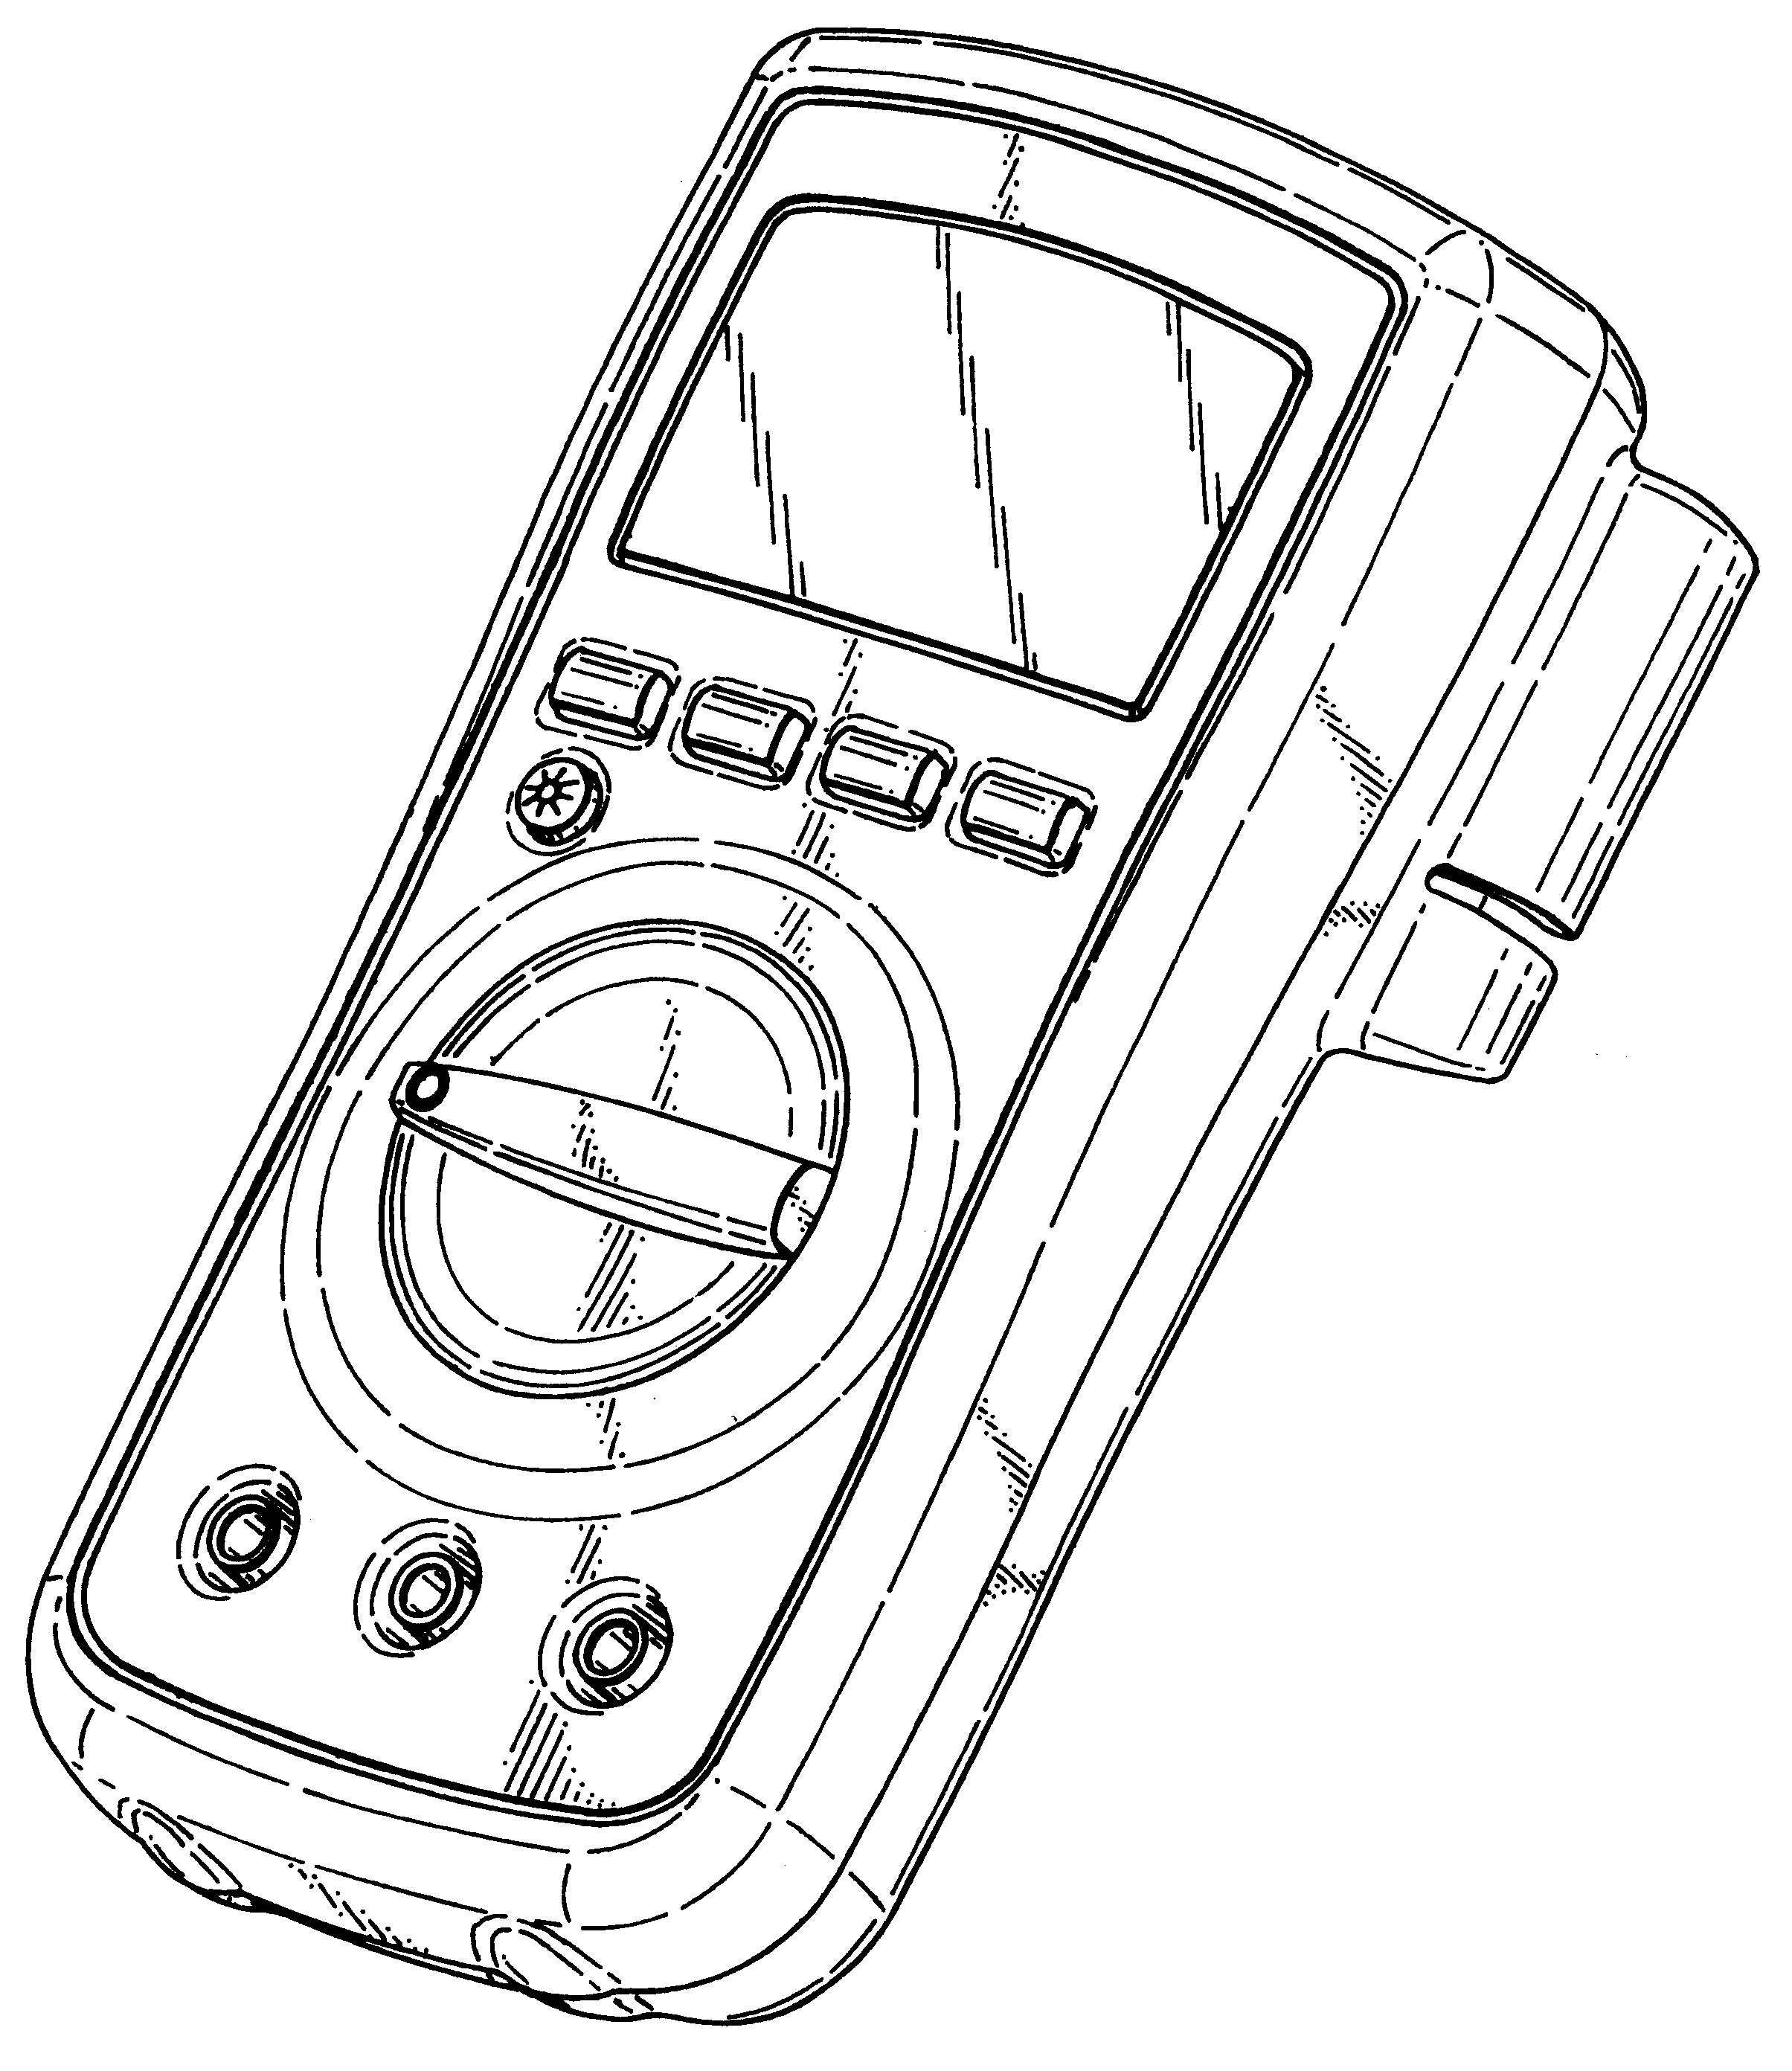 patent usd446735 - digital multimeter